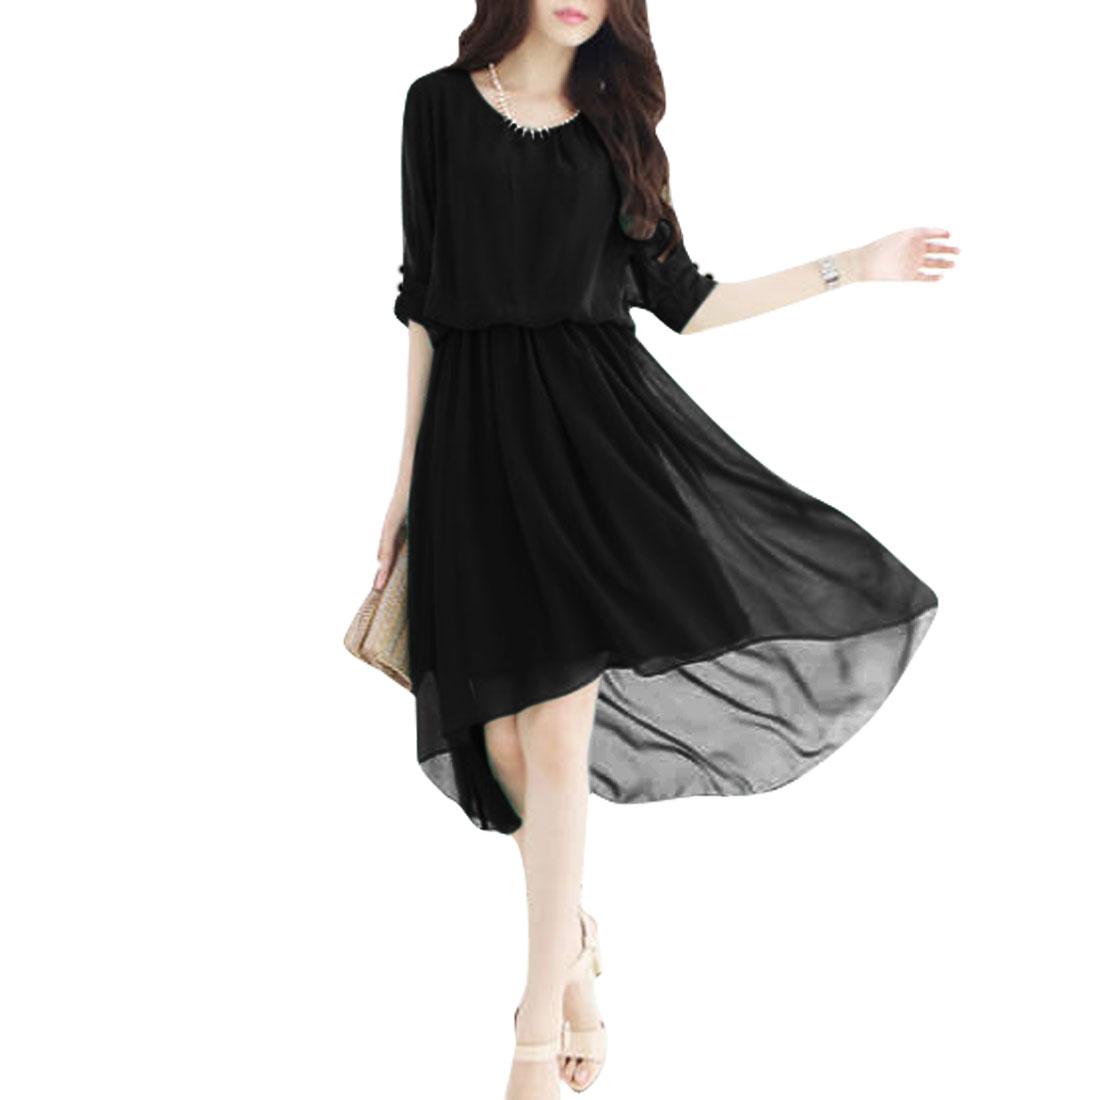 Ladies Short Sleeve Cut Out Shoulder Fashional Dress Black XS